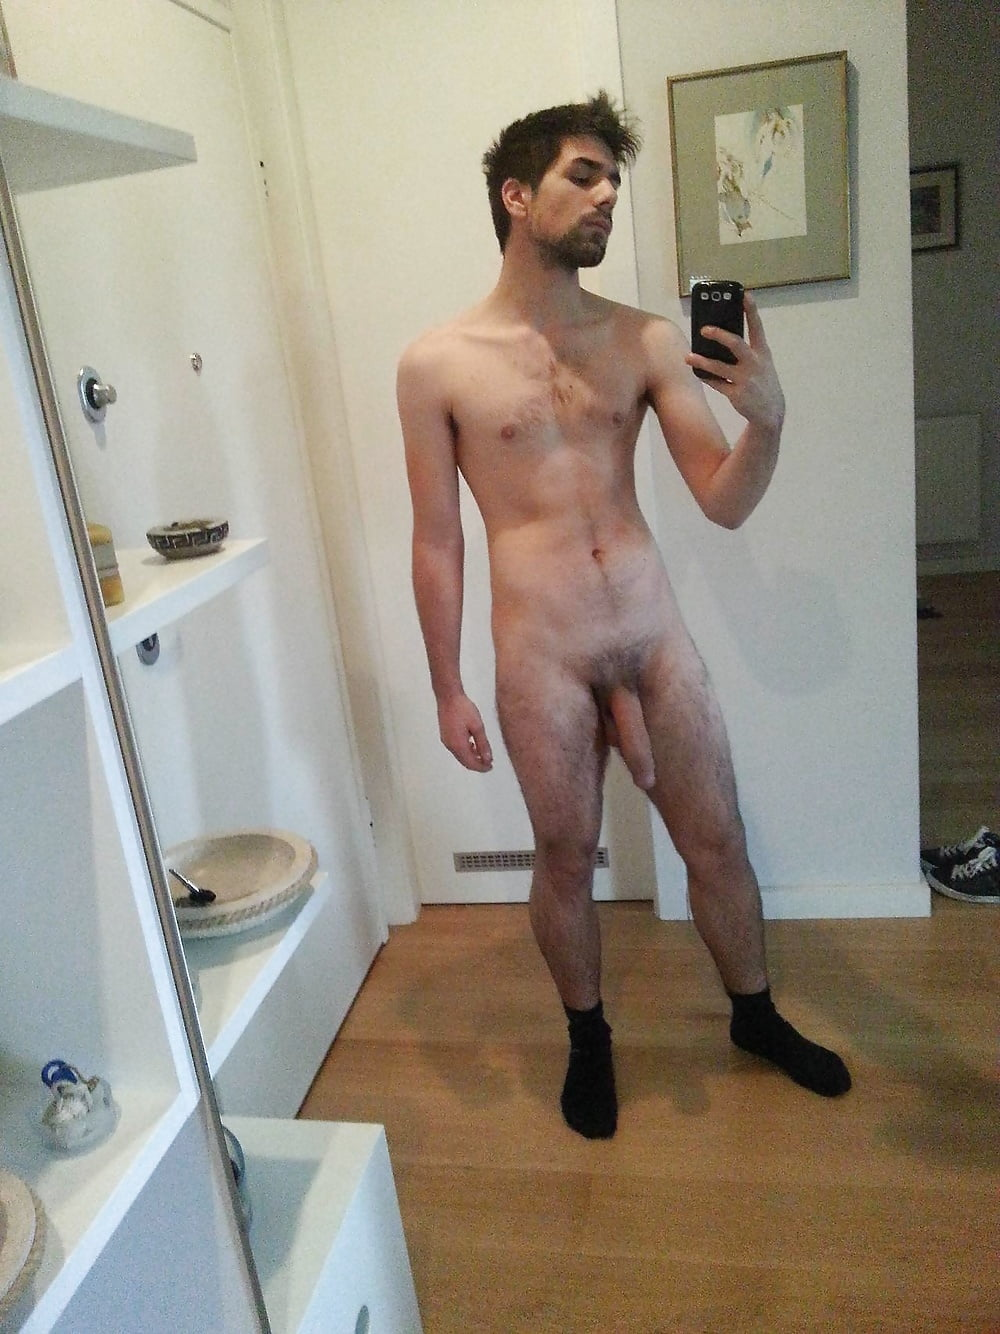 Surprised naked guys